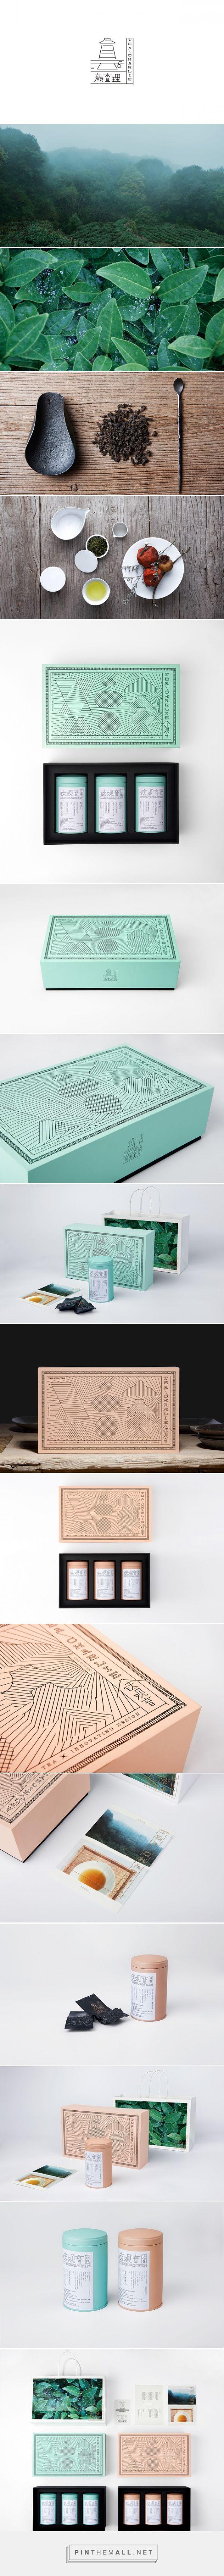 Tea Charlie packaging designed by YanYaoming - http://www.packagingoftheworld.com/2016/01/tea-charlie.html